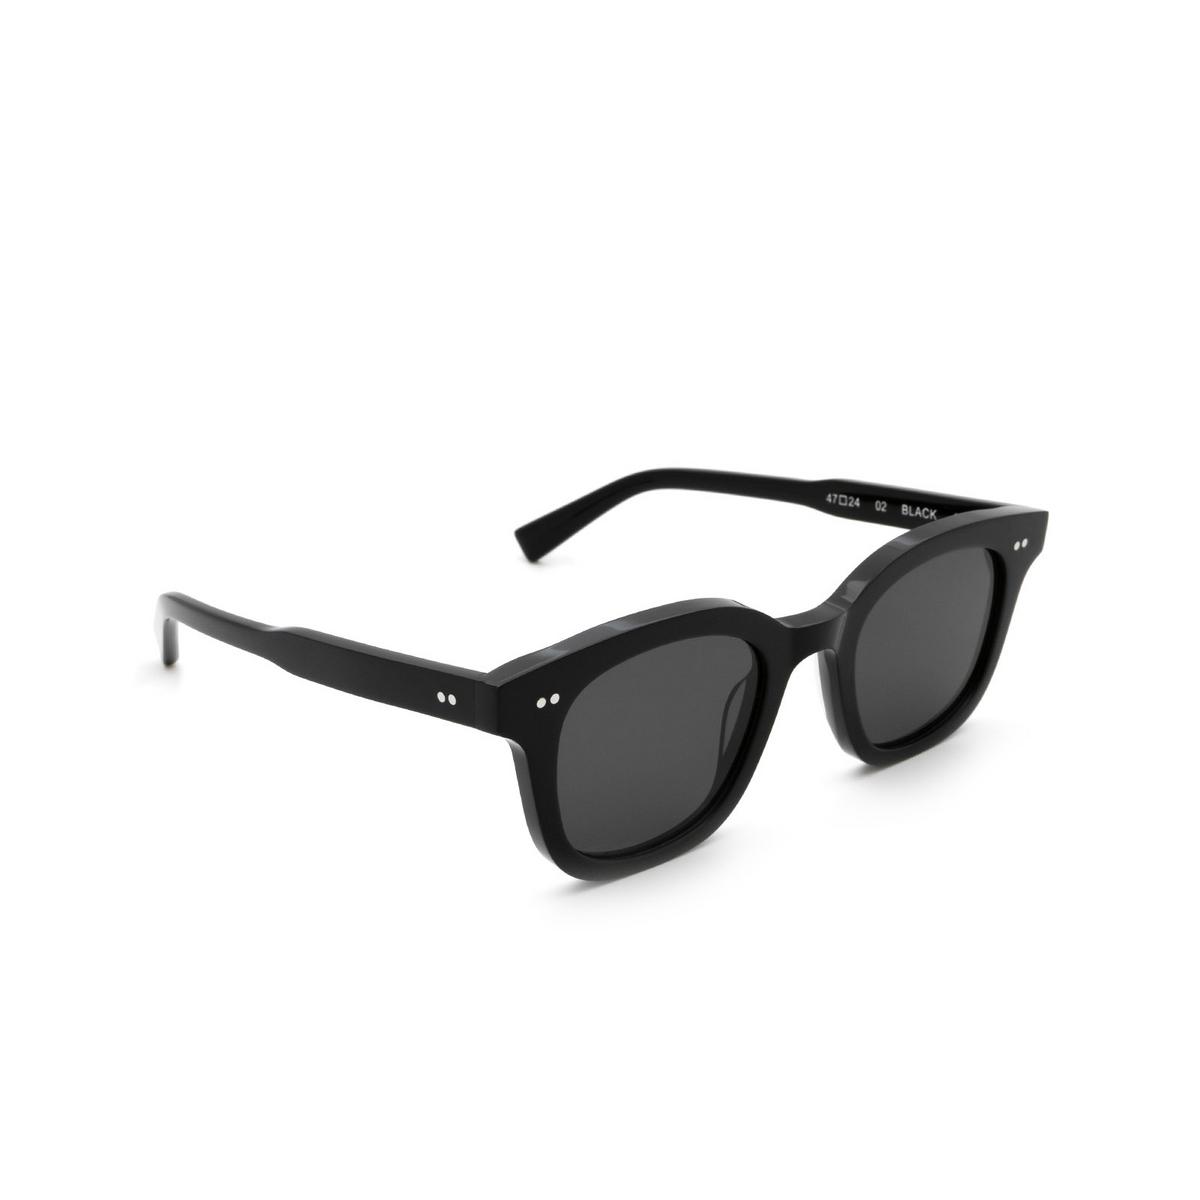 Chimi® Square Sunglasses: 02 color Black - three-quarters view.